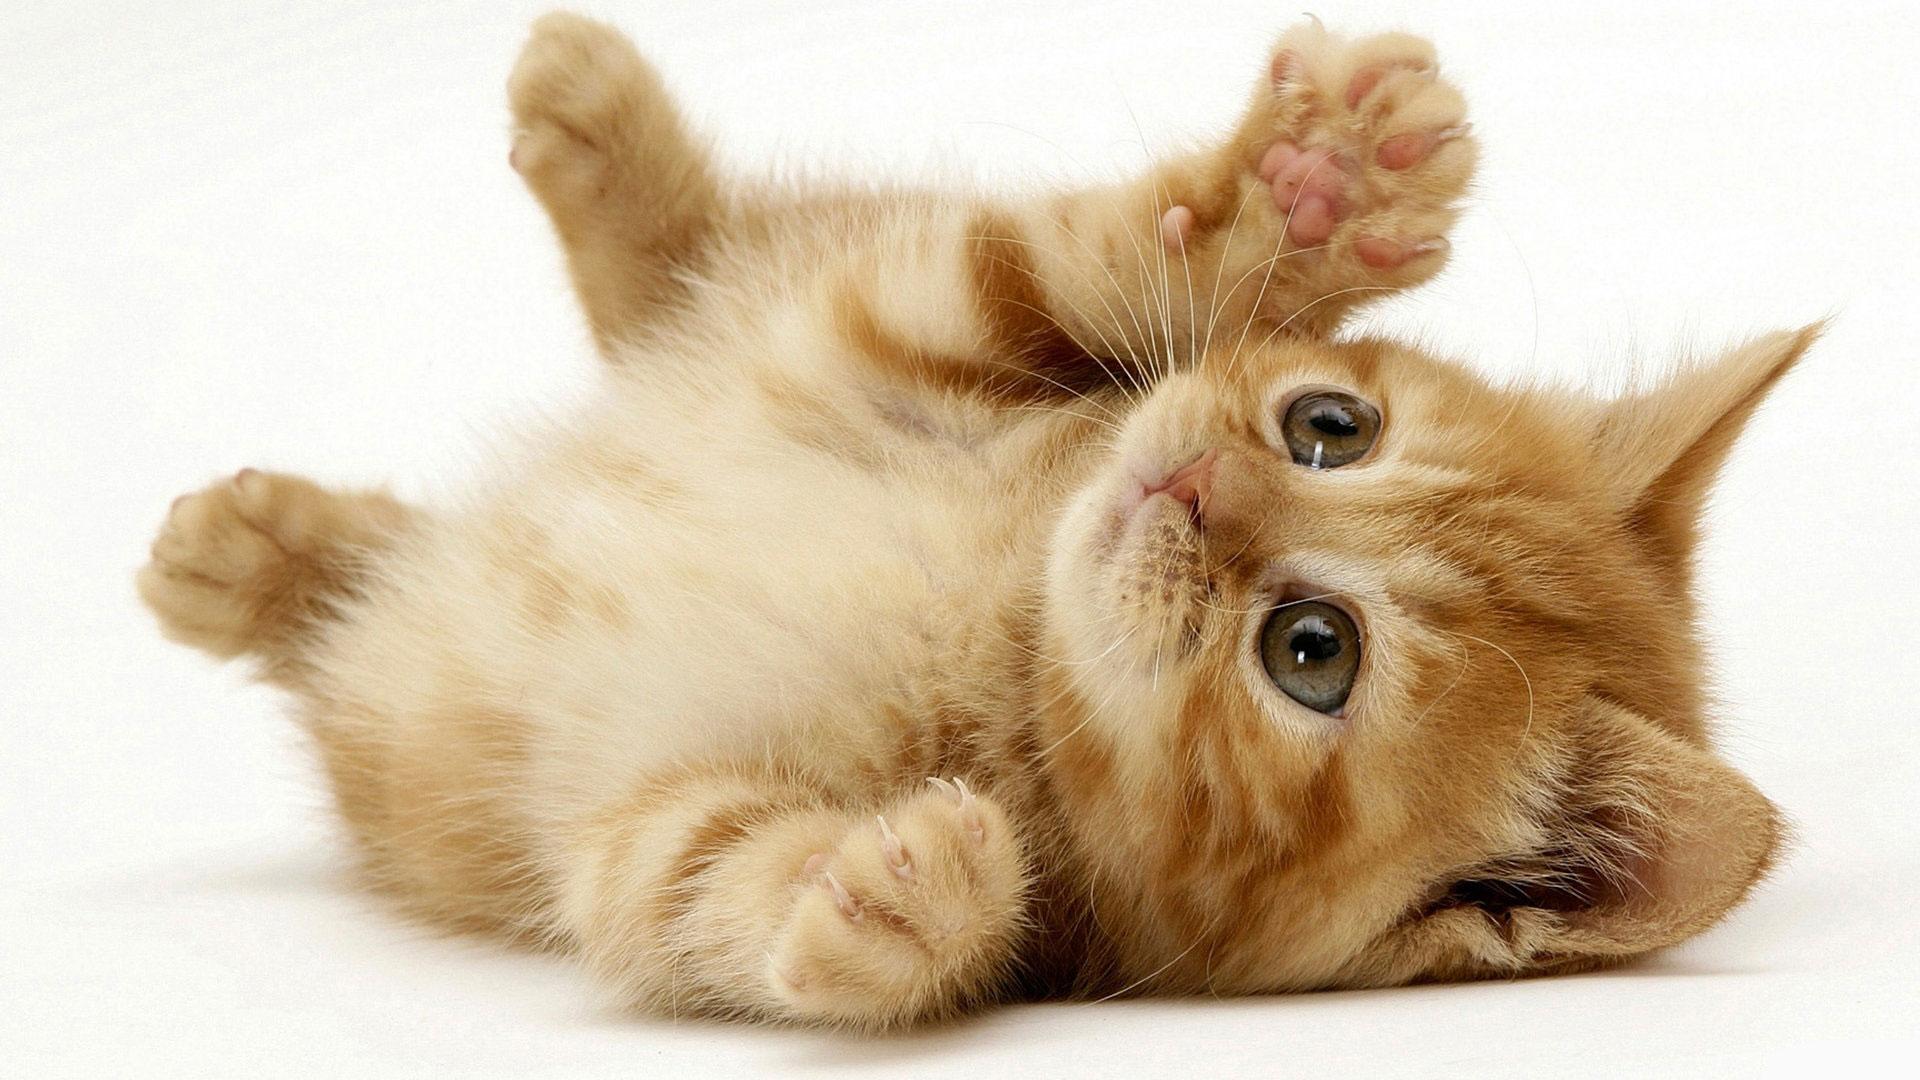 cute cats wallpaper 2 filesize x1024 wallpaper backgrounds 1280 1024 1920x1080